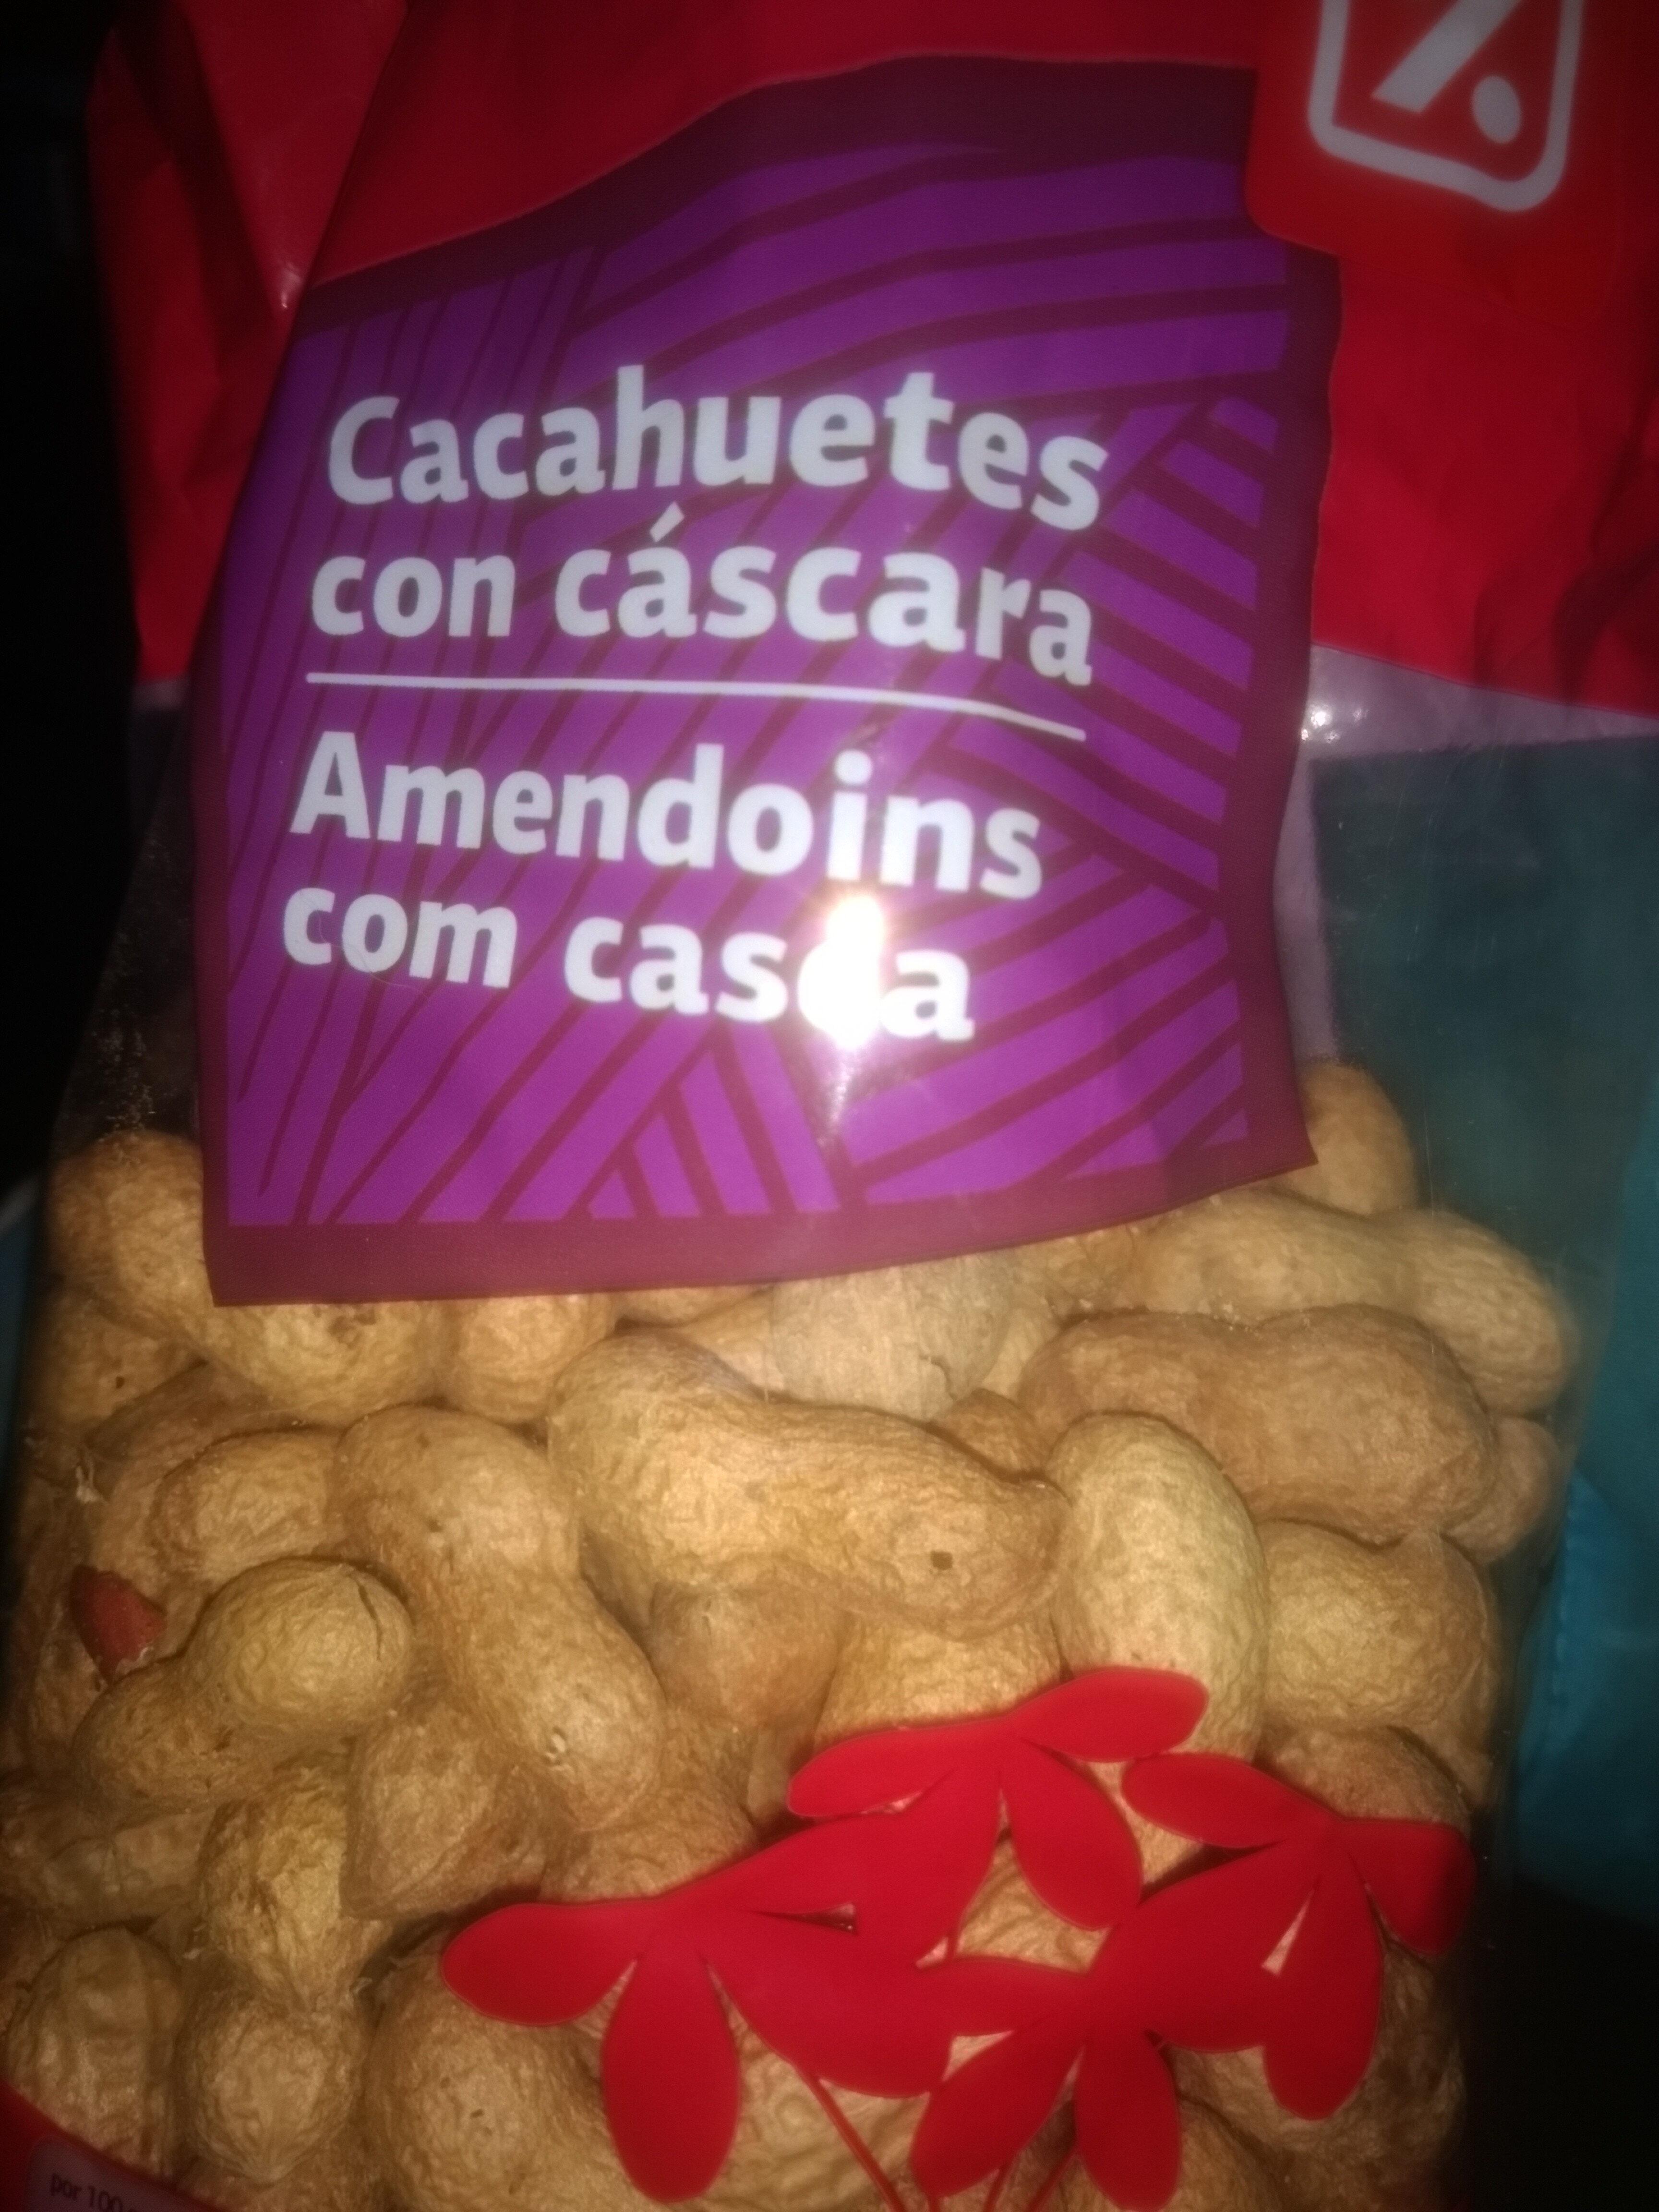 Cacahuetes con cáscara - Product - es